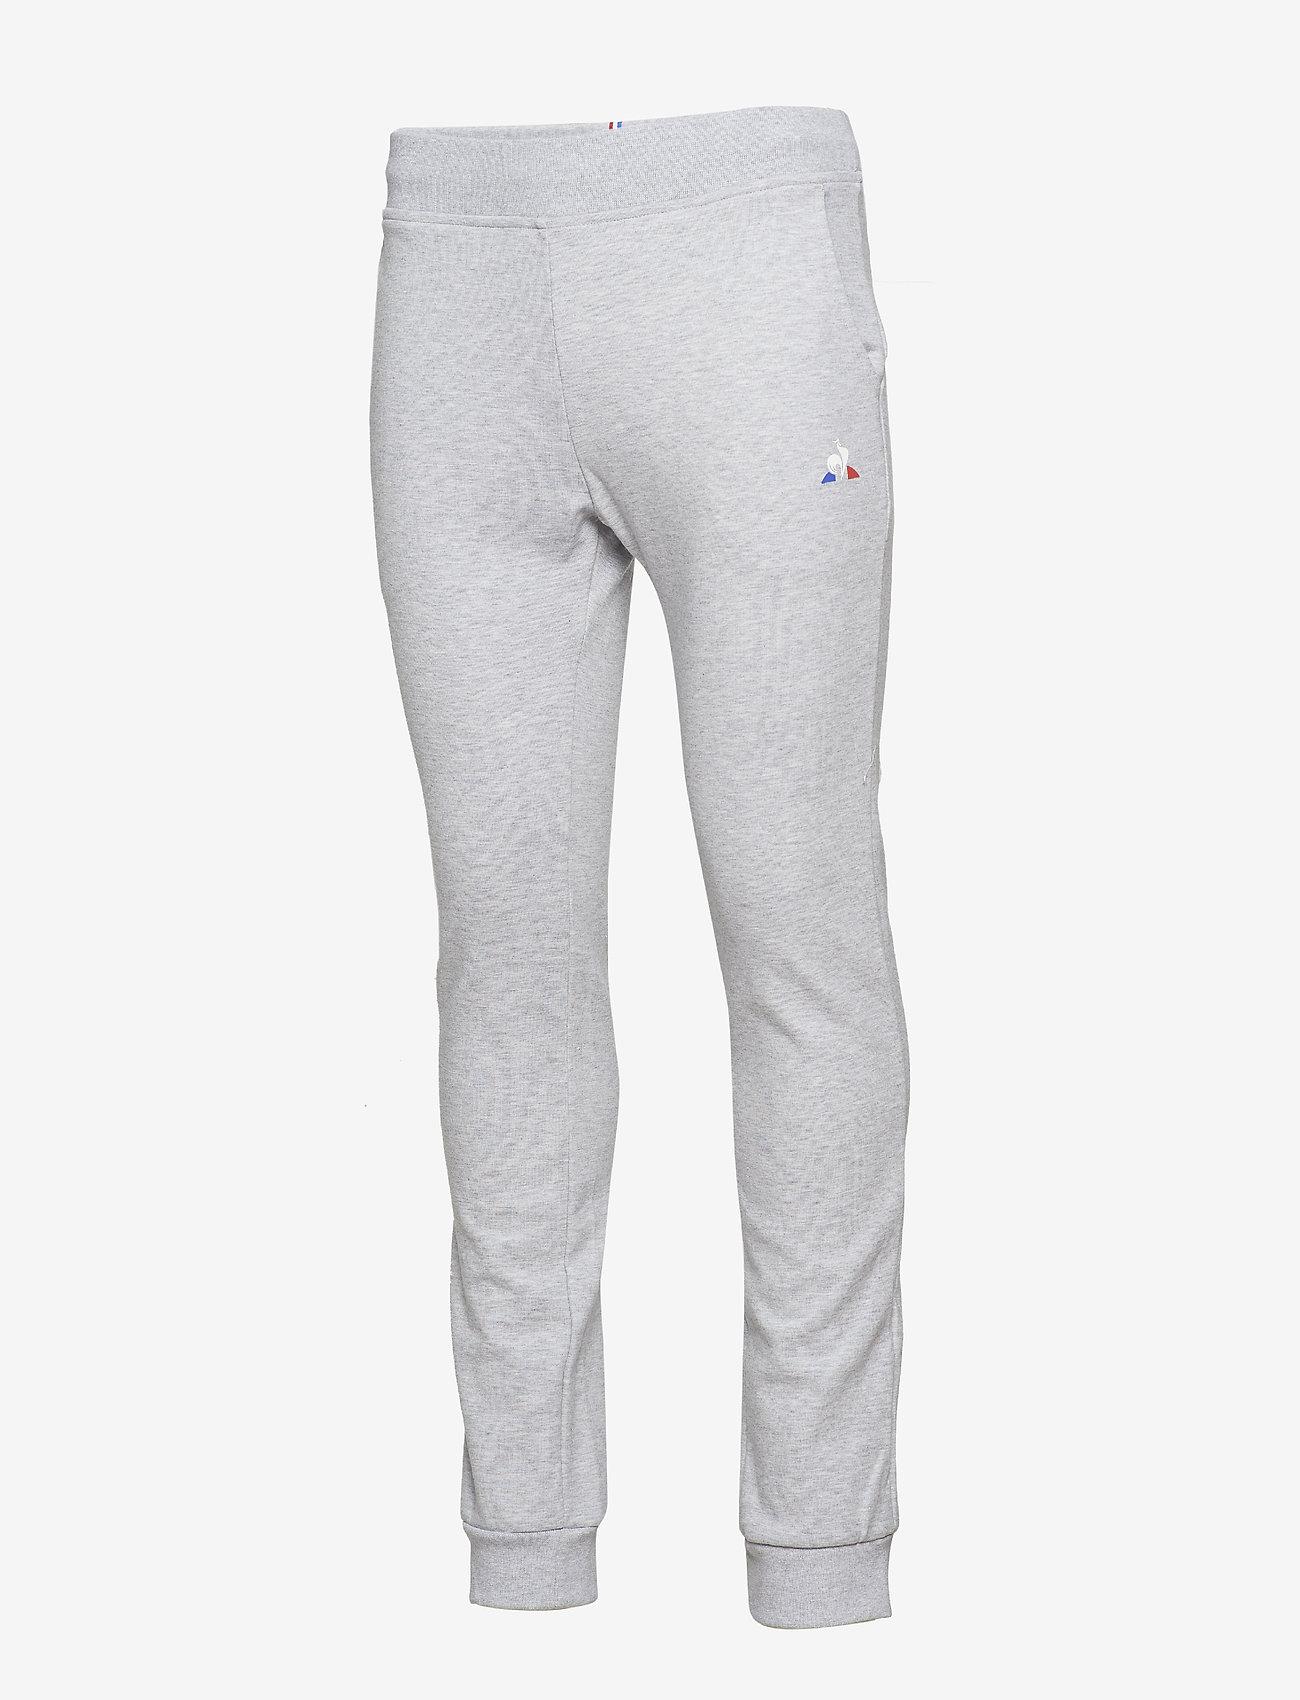 Le Coq Sportif ESS Pant Slim N°1 M - Joggebukser GRIS CHINé CLAIR - Menn Klær